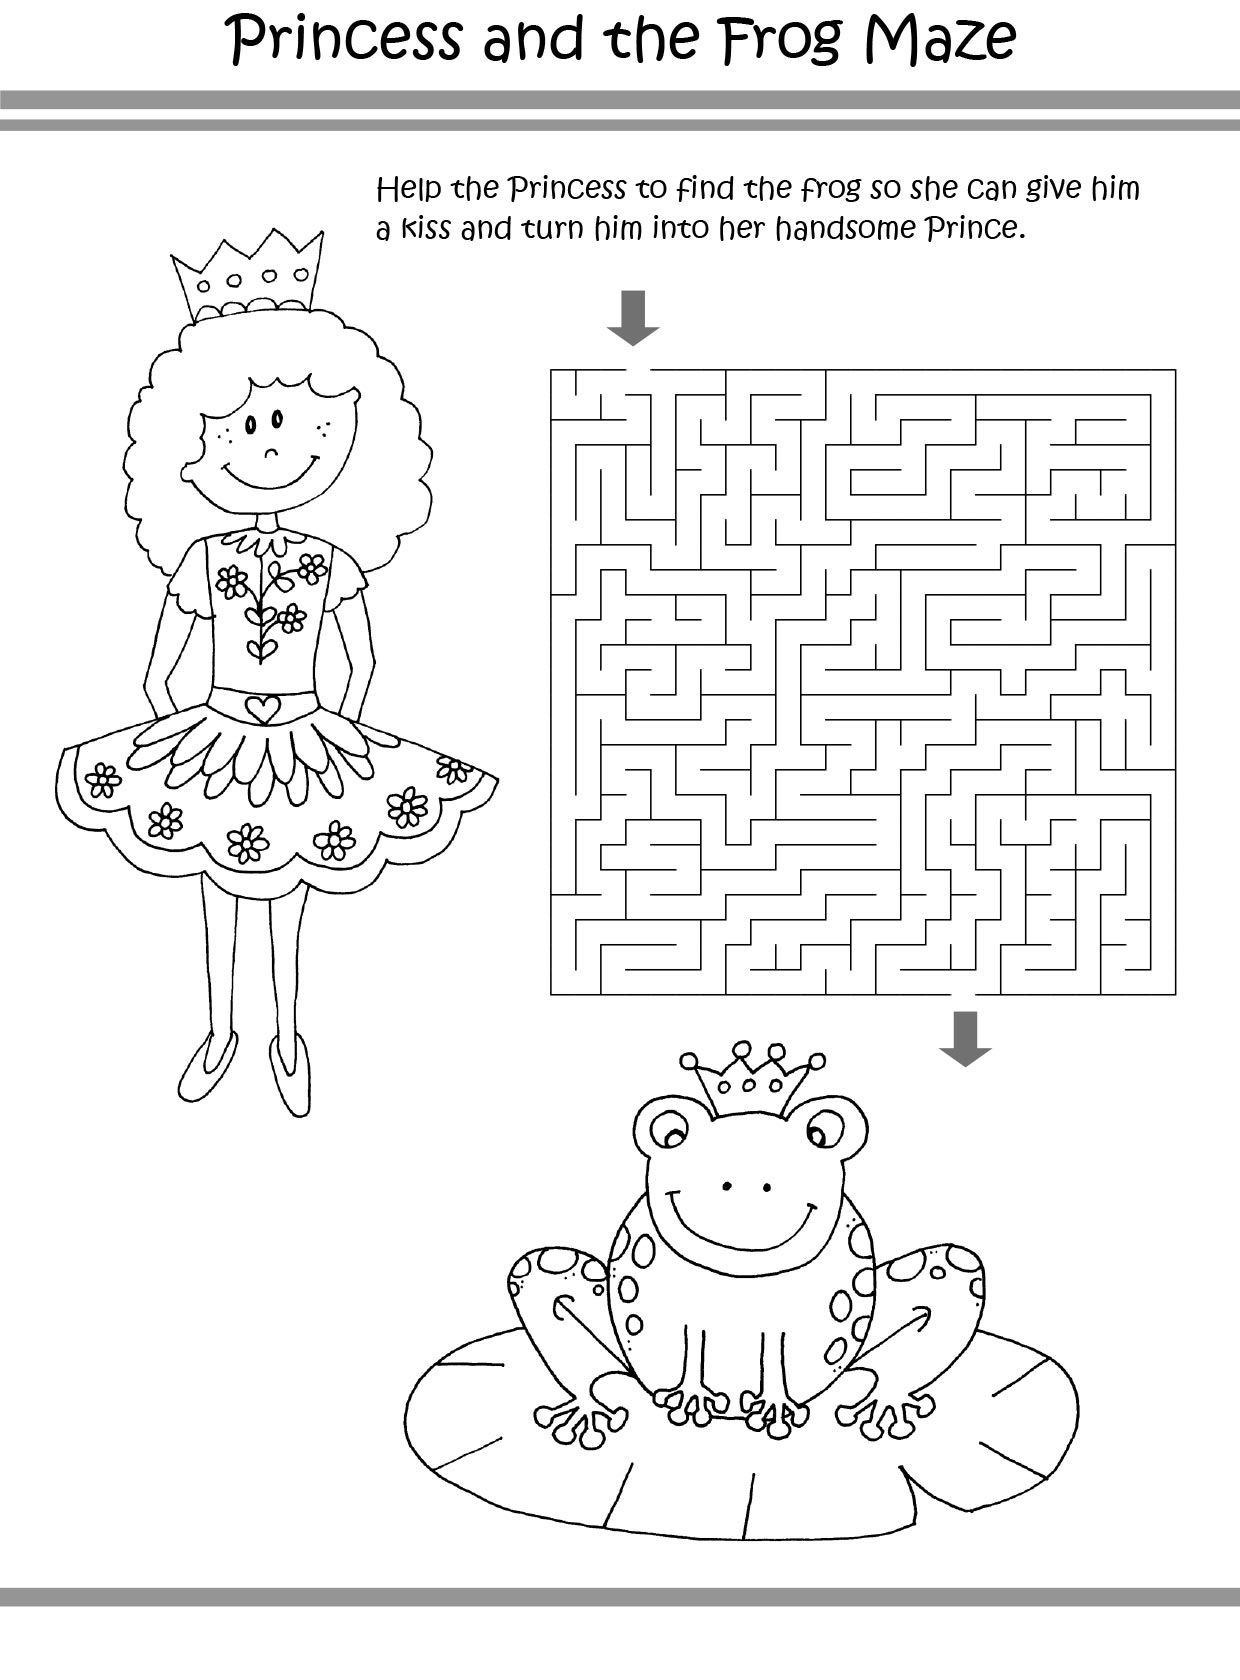 Princess Puzzle coloring pages